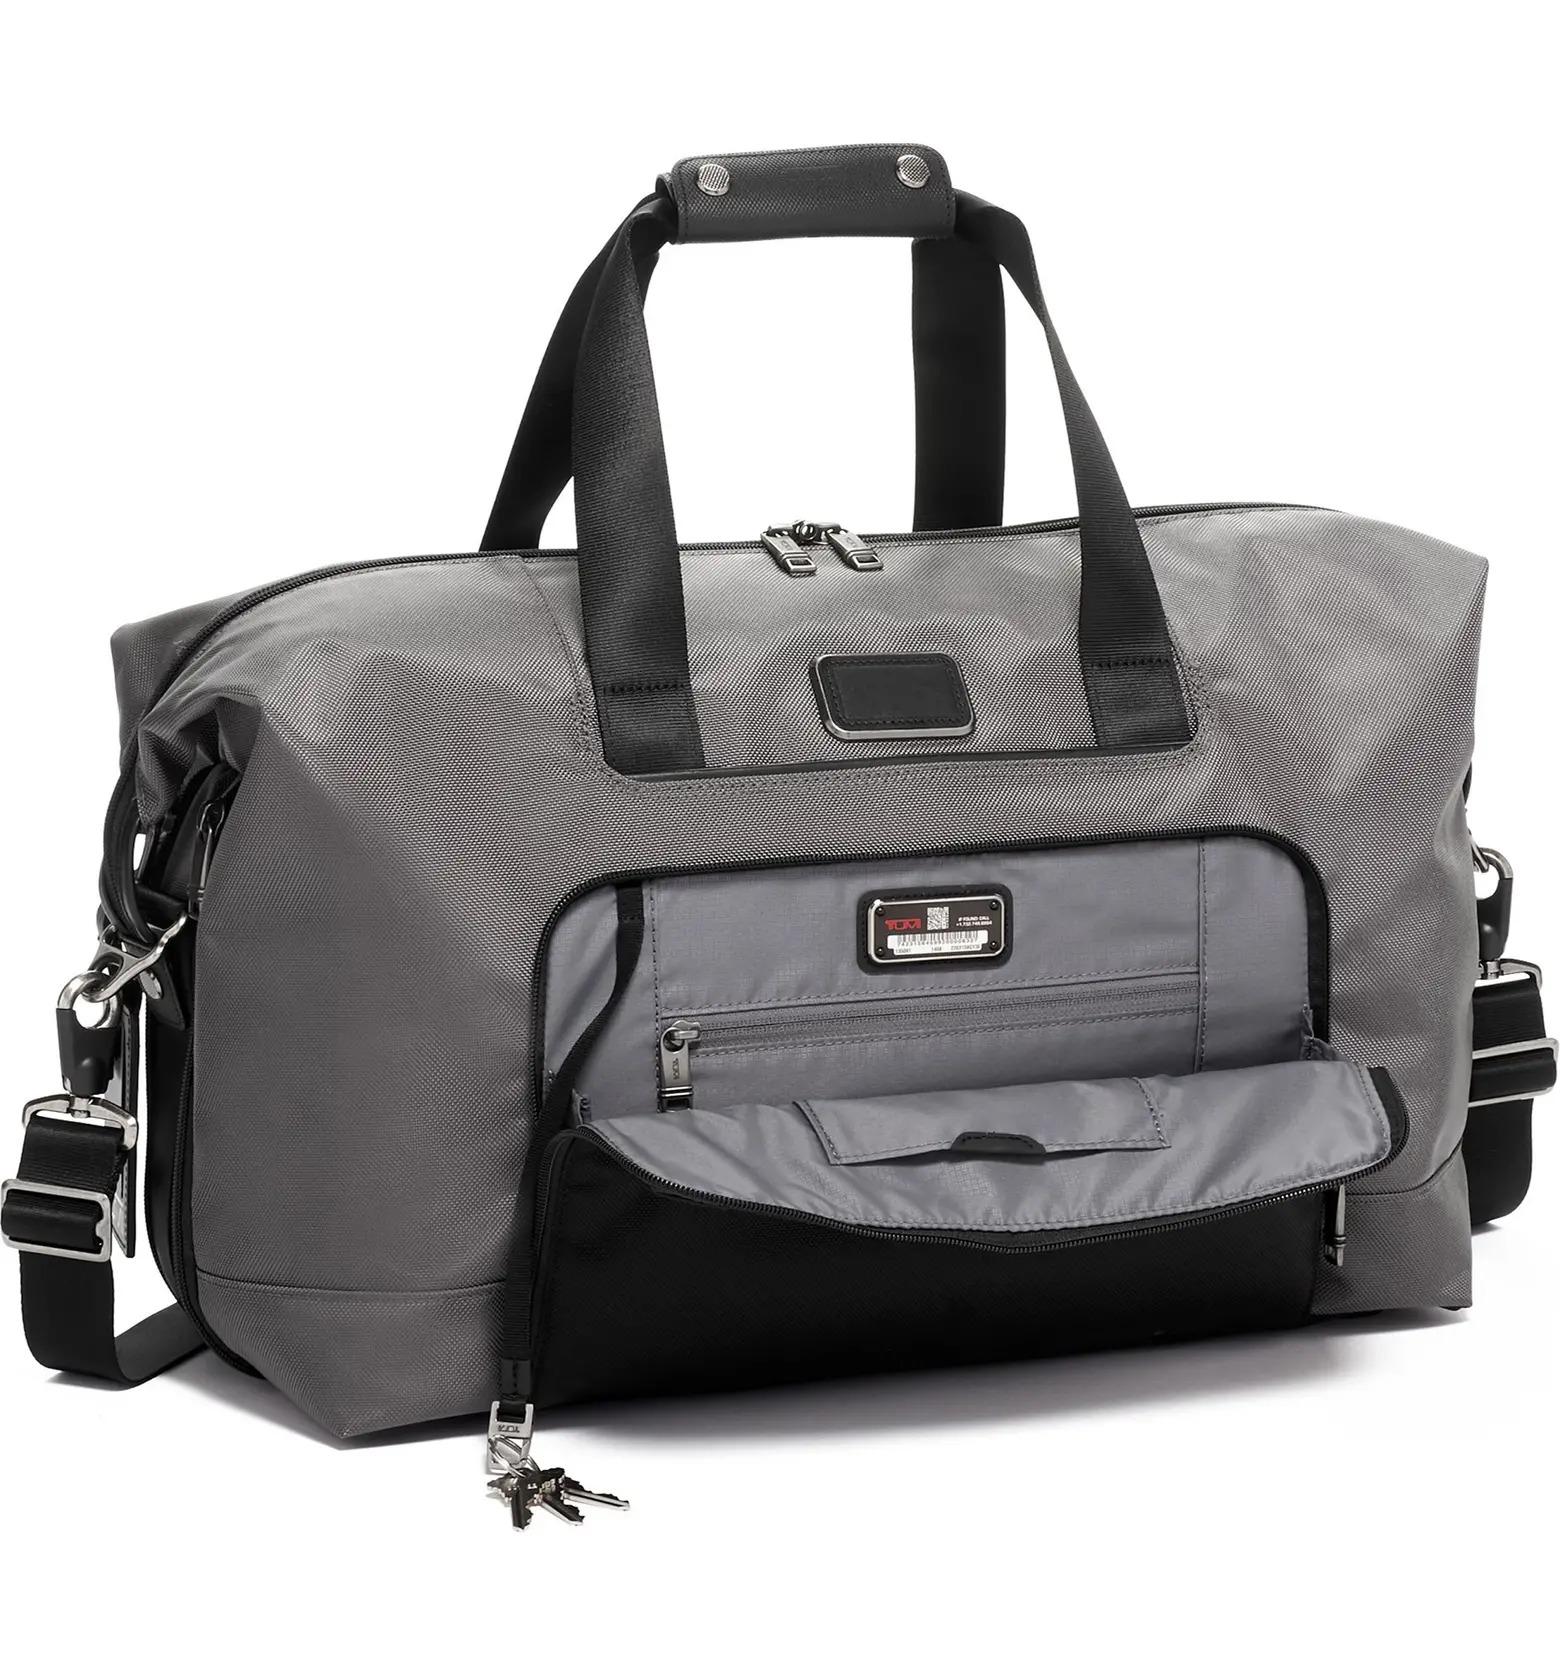 Tumi Alpha 3 Expansion Duffel Bag